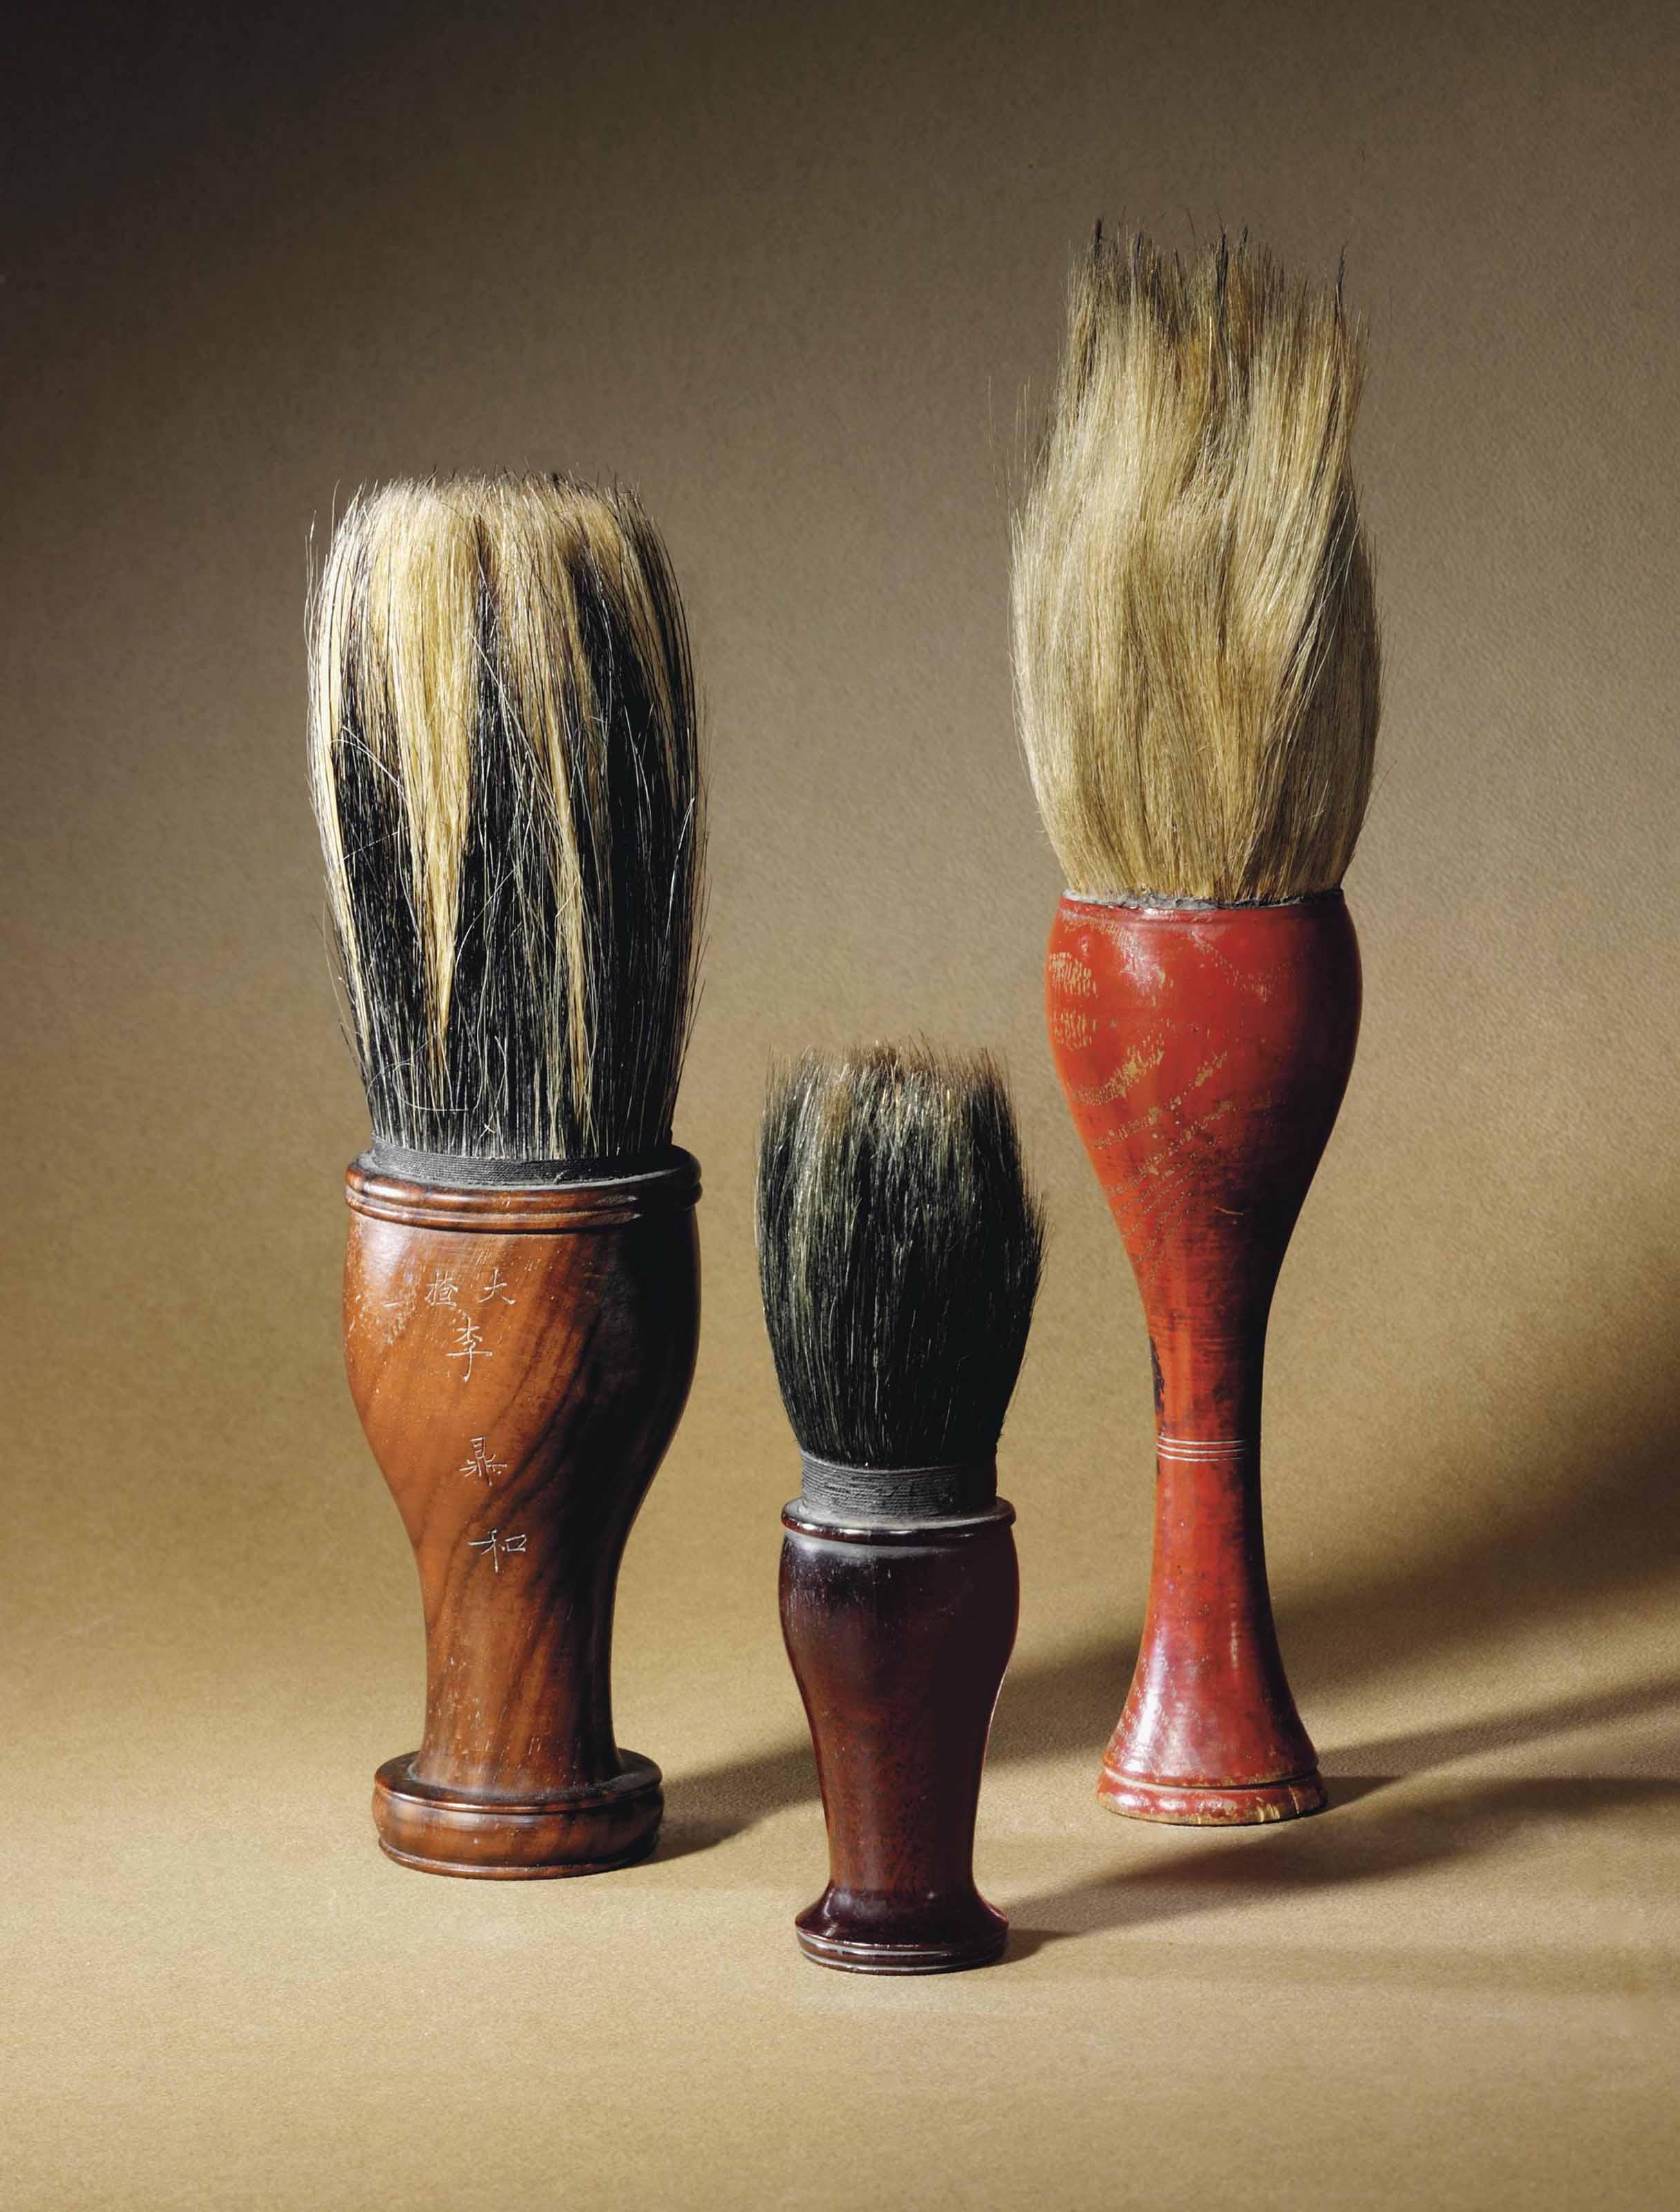 THREE SCHOLAR'S BRUSHES